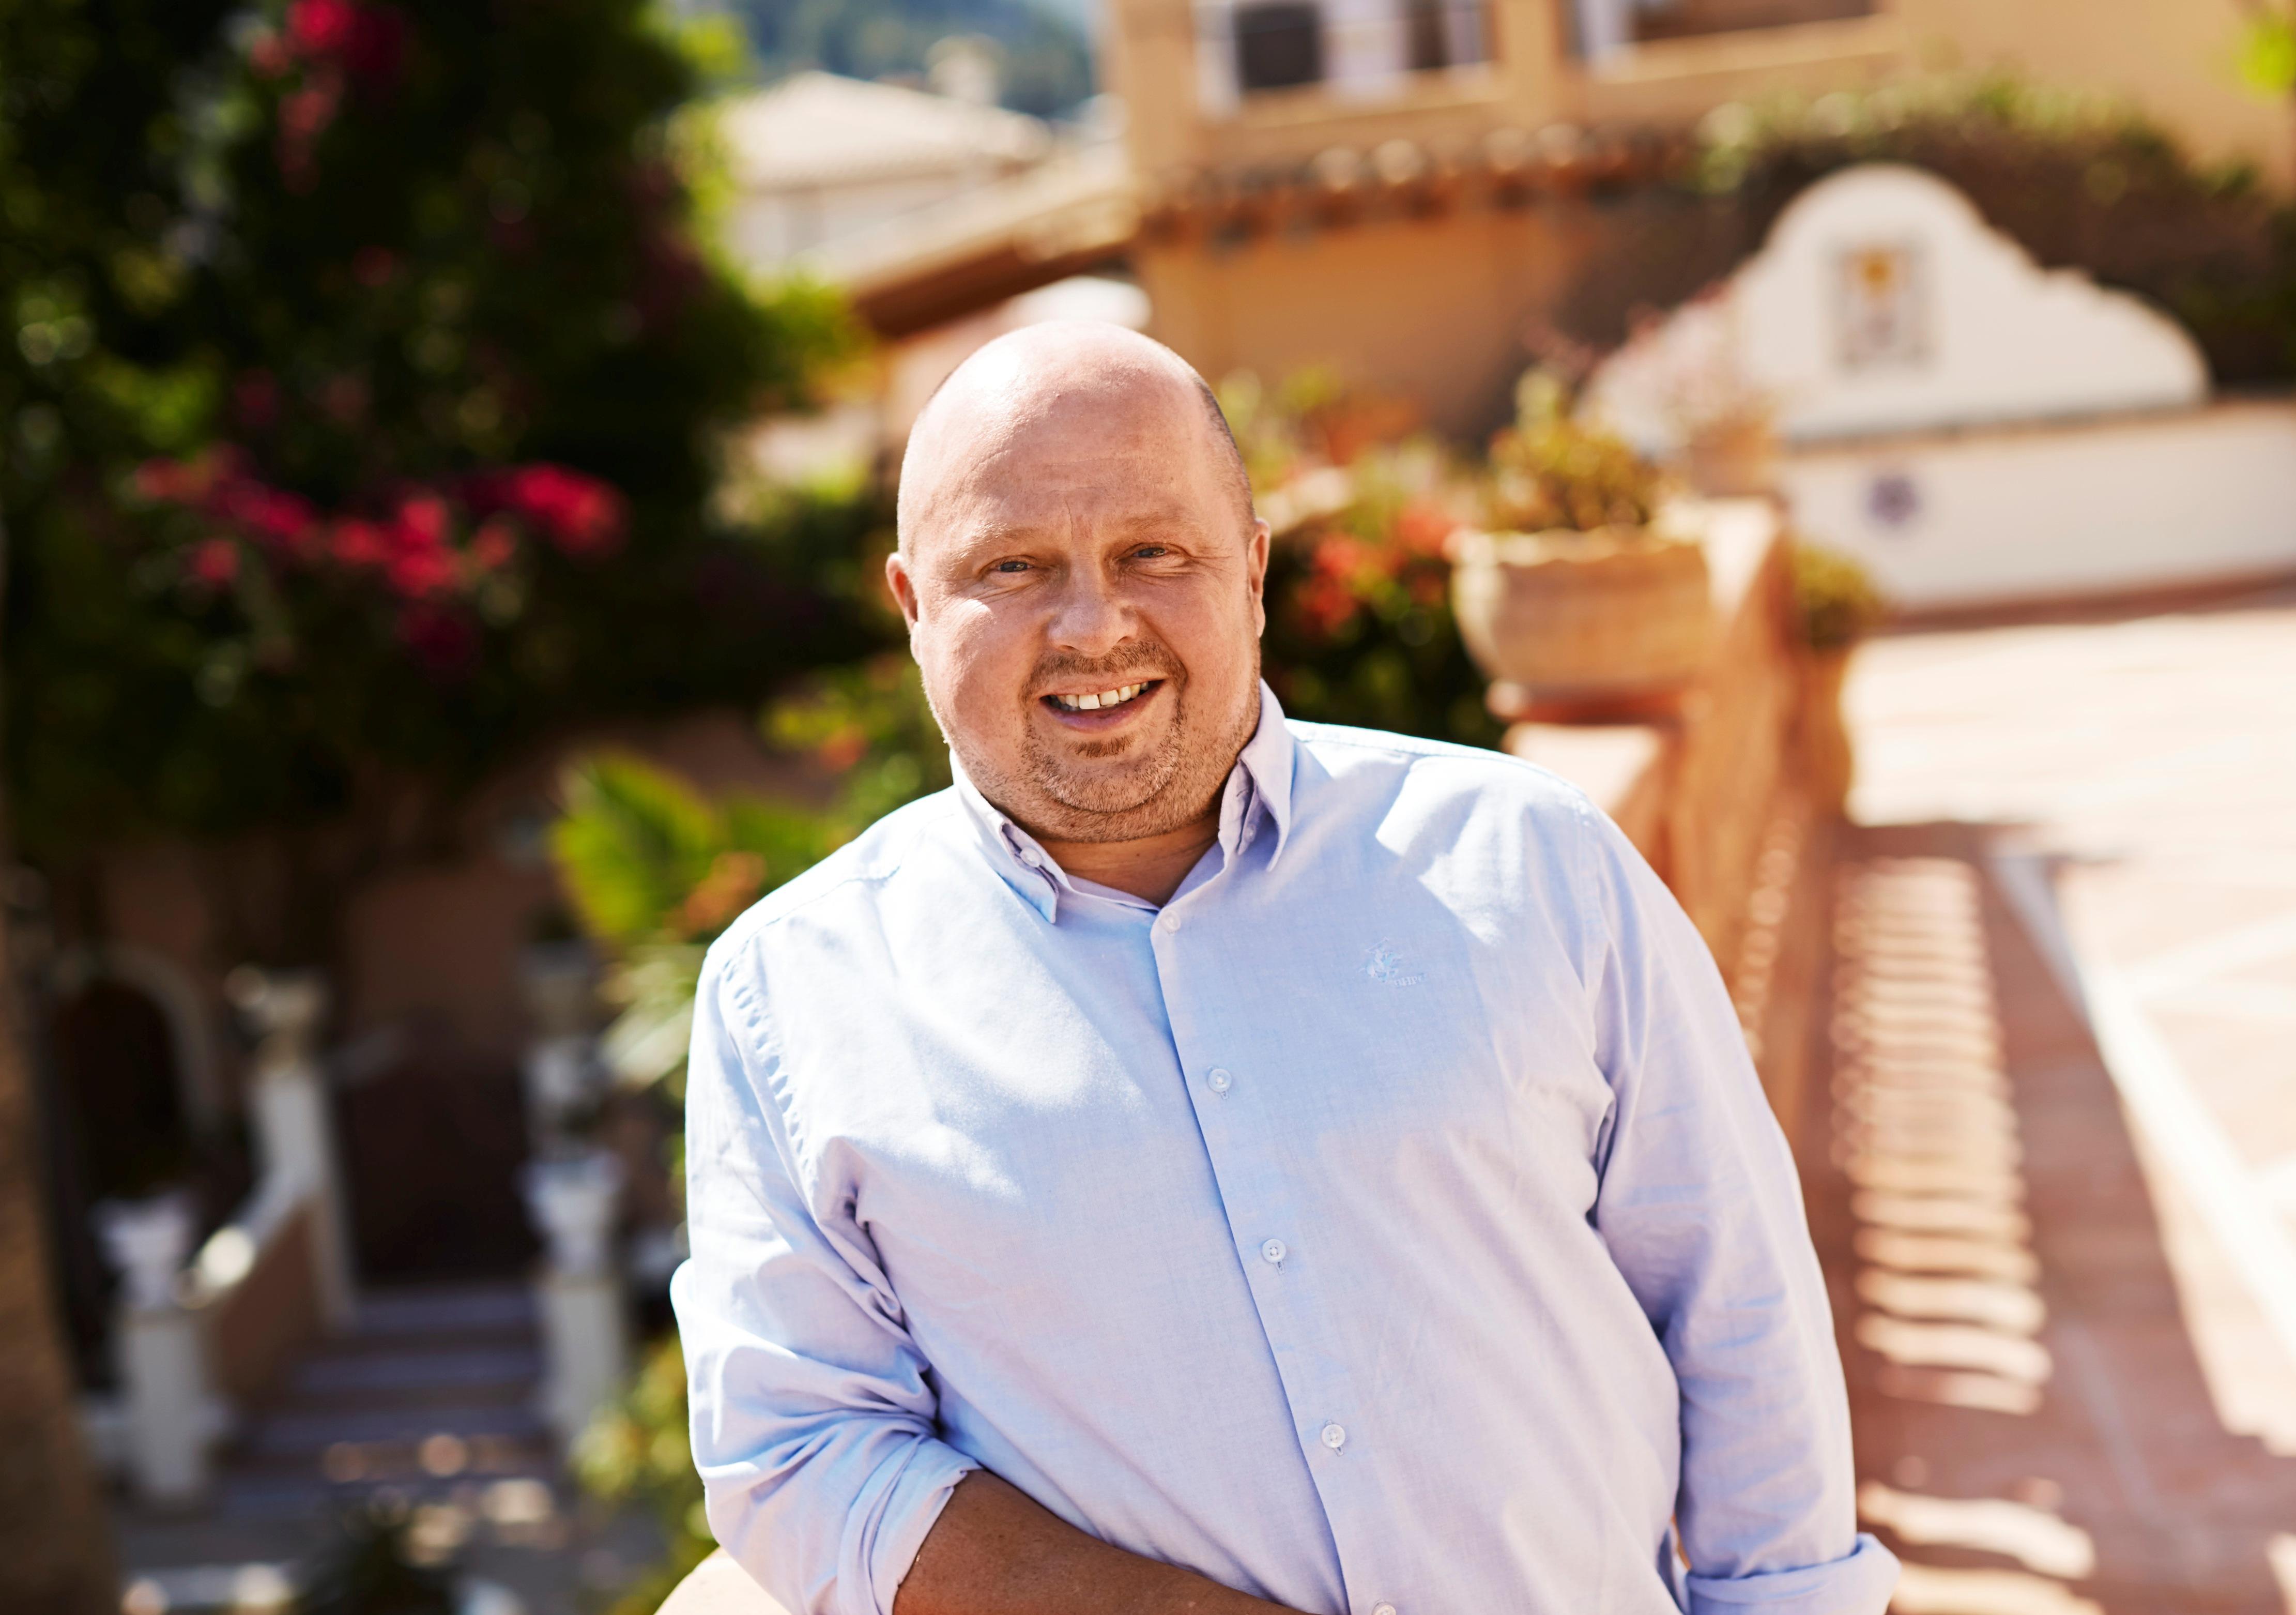 Peder Hornshøj, administrerende direktør for såvel Bravo Tours, som han var med til at grundlægge som for TravelCo Nordic, hvor Bravo Tours er største aktiv. Pressefoto: Bravo Tours.